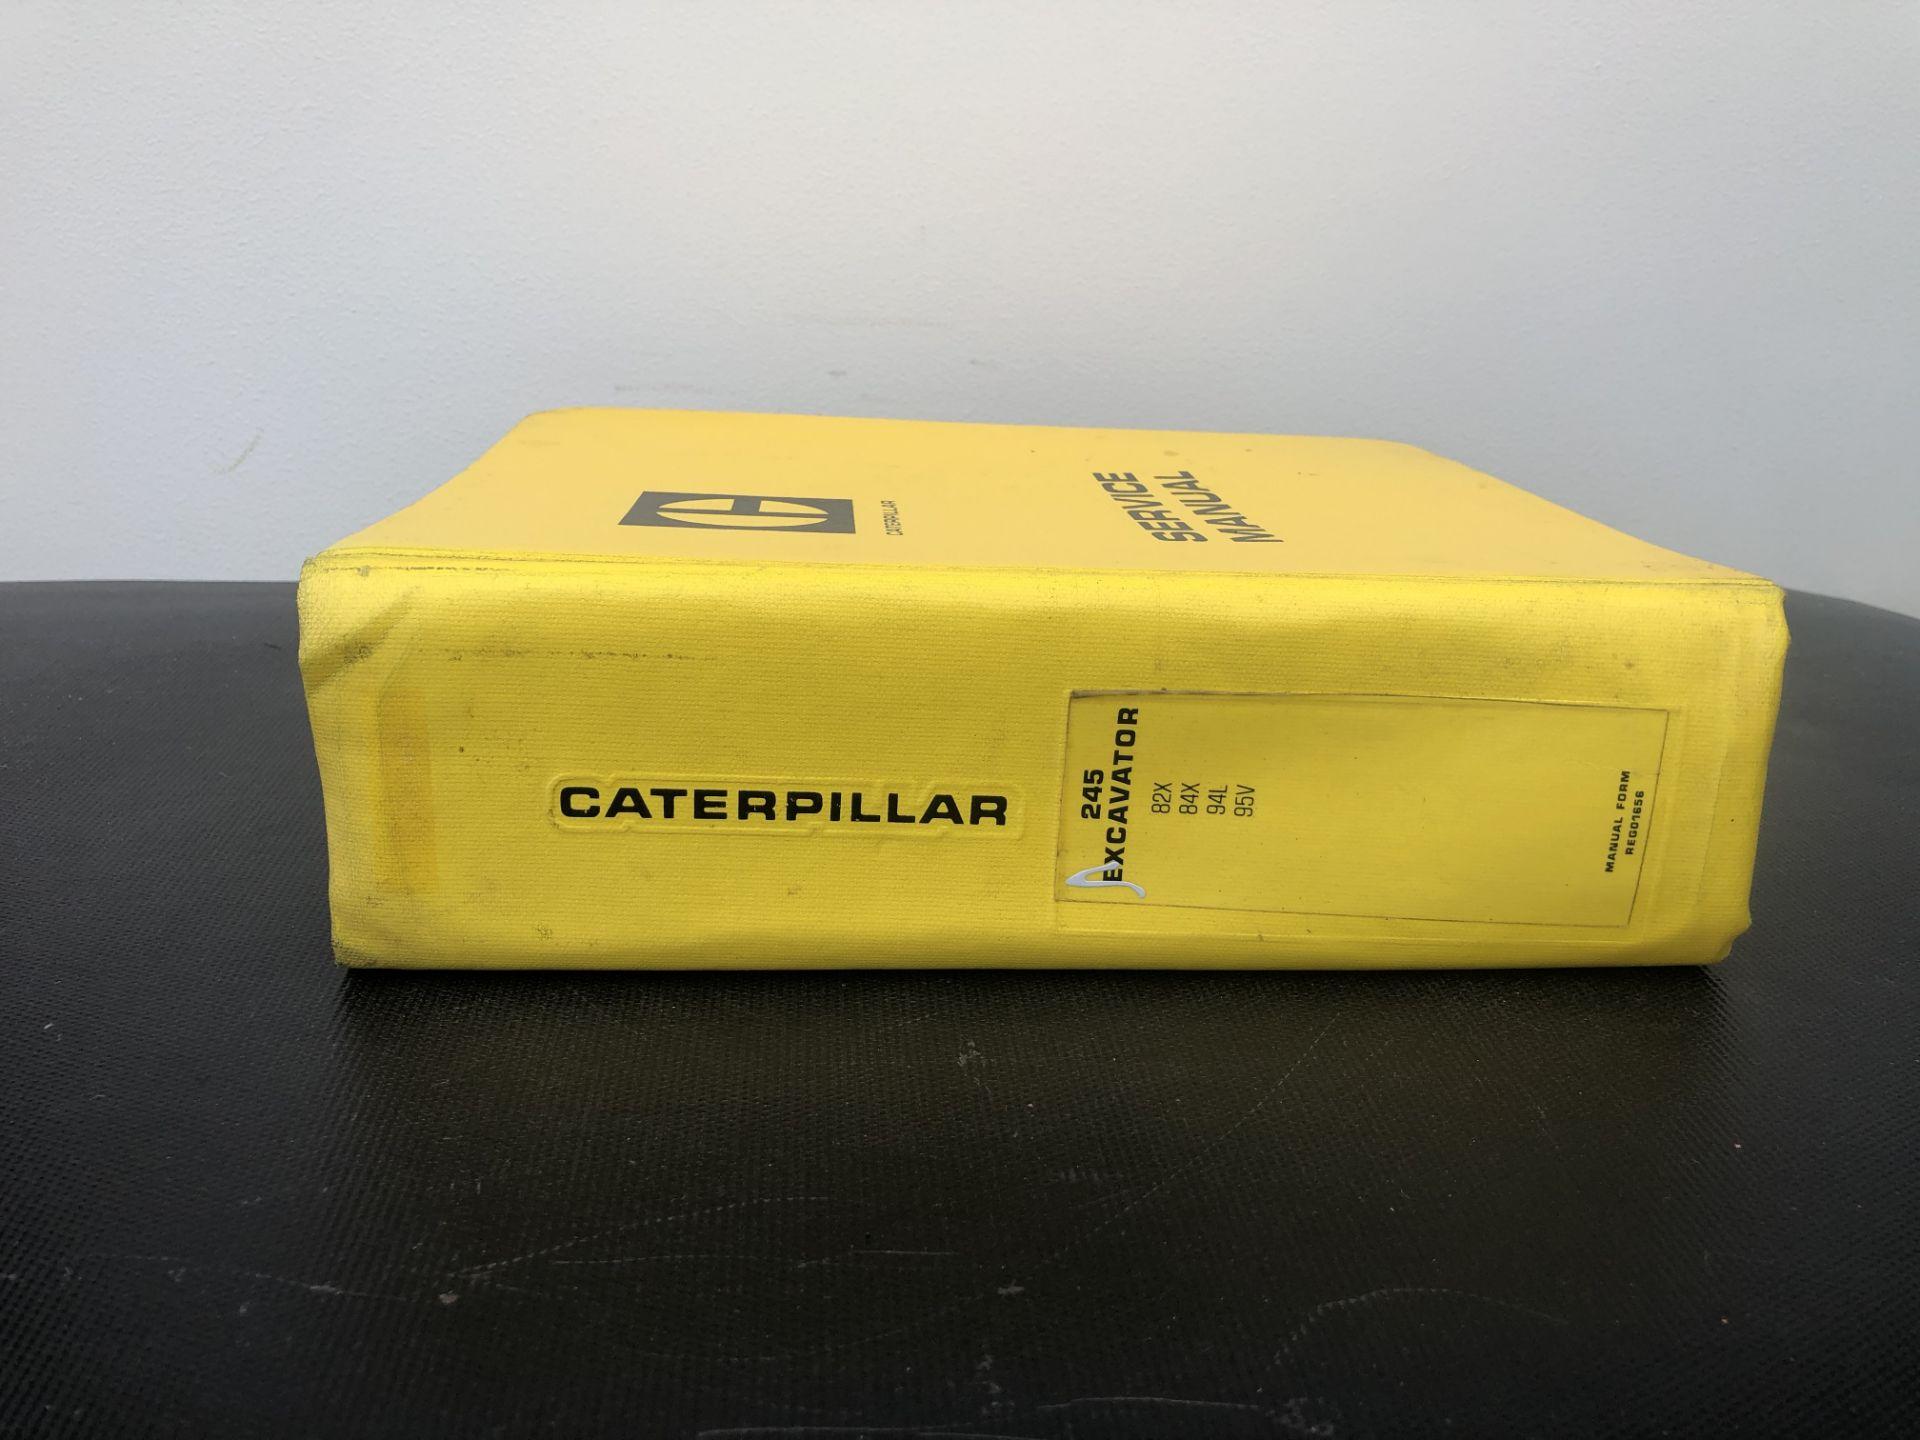 CATERPILLAR 245 SERVICE MANUAL, GENUINE FACTORY CAT WORKSHOP MANUAL